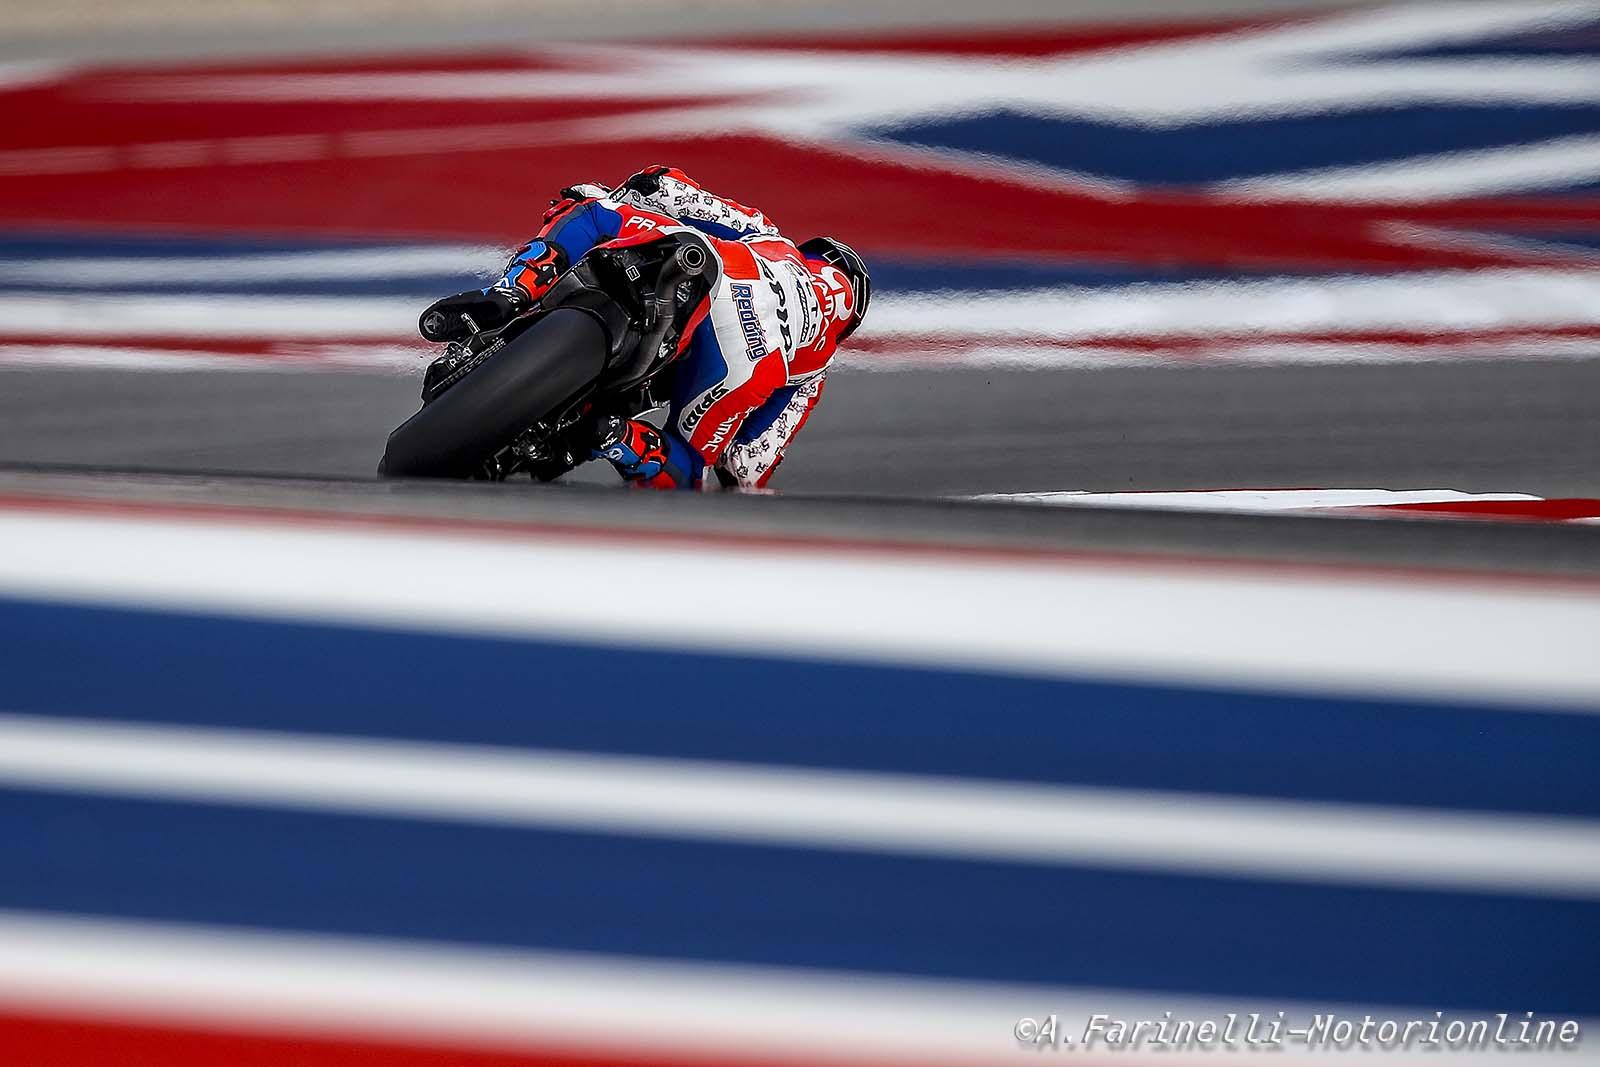 MotoGP Austin 2017Day_2 Foto MotoGP alta risoluzione 22 di 54